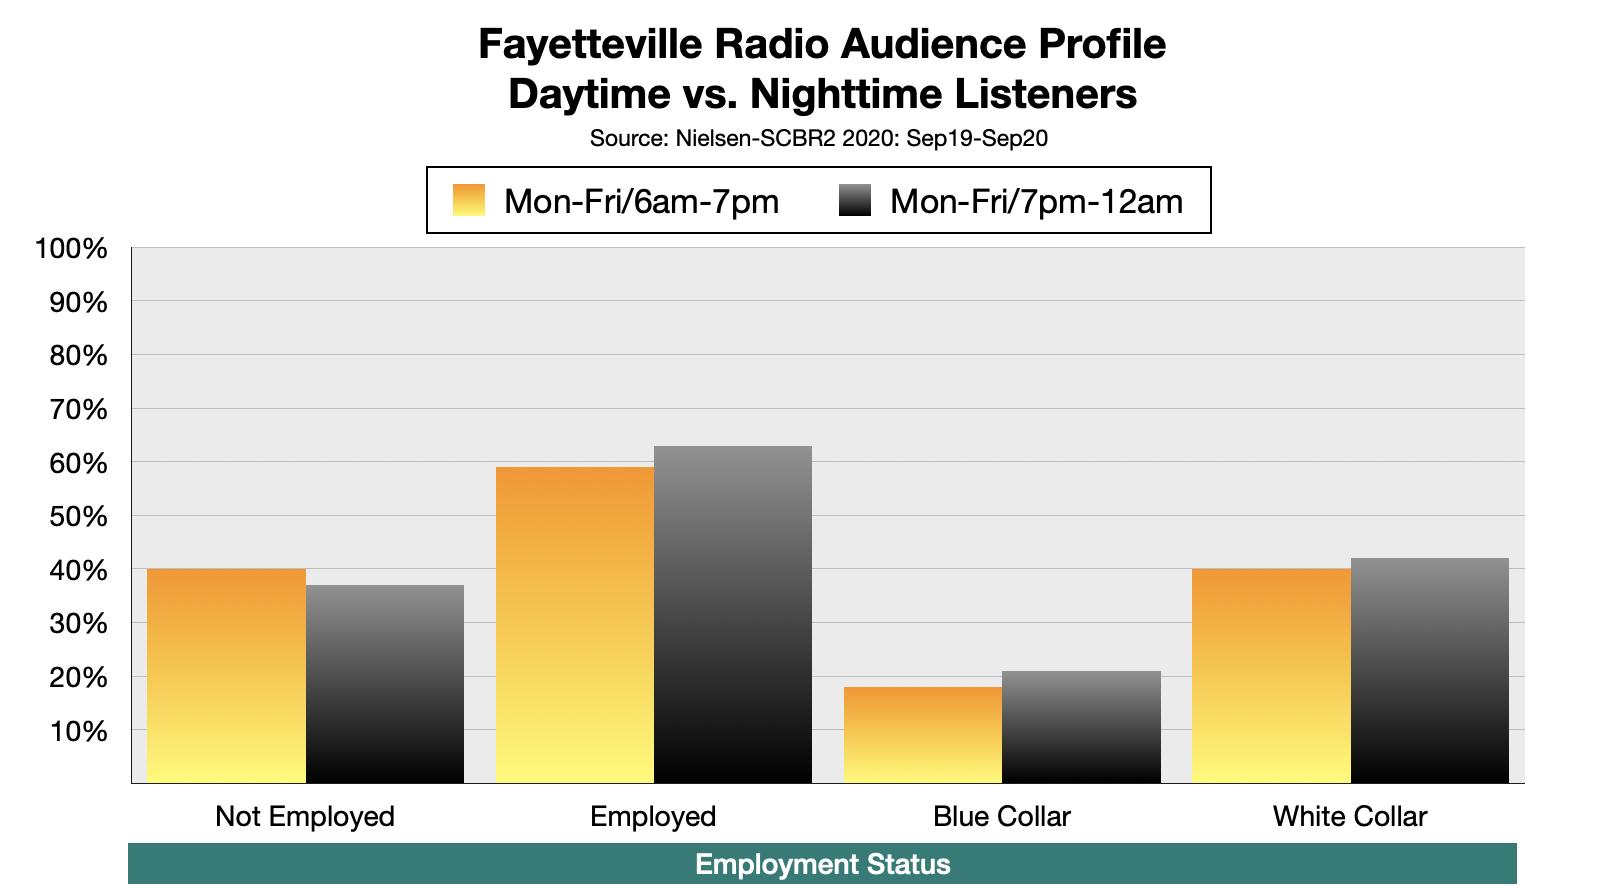 Advertising On Fayetteville, NC Radio: Employment Status